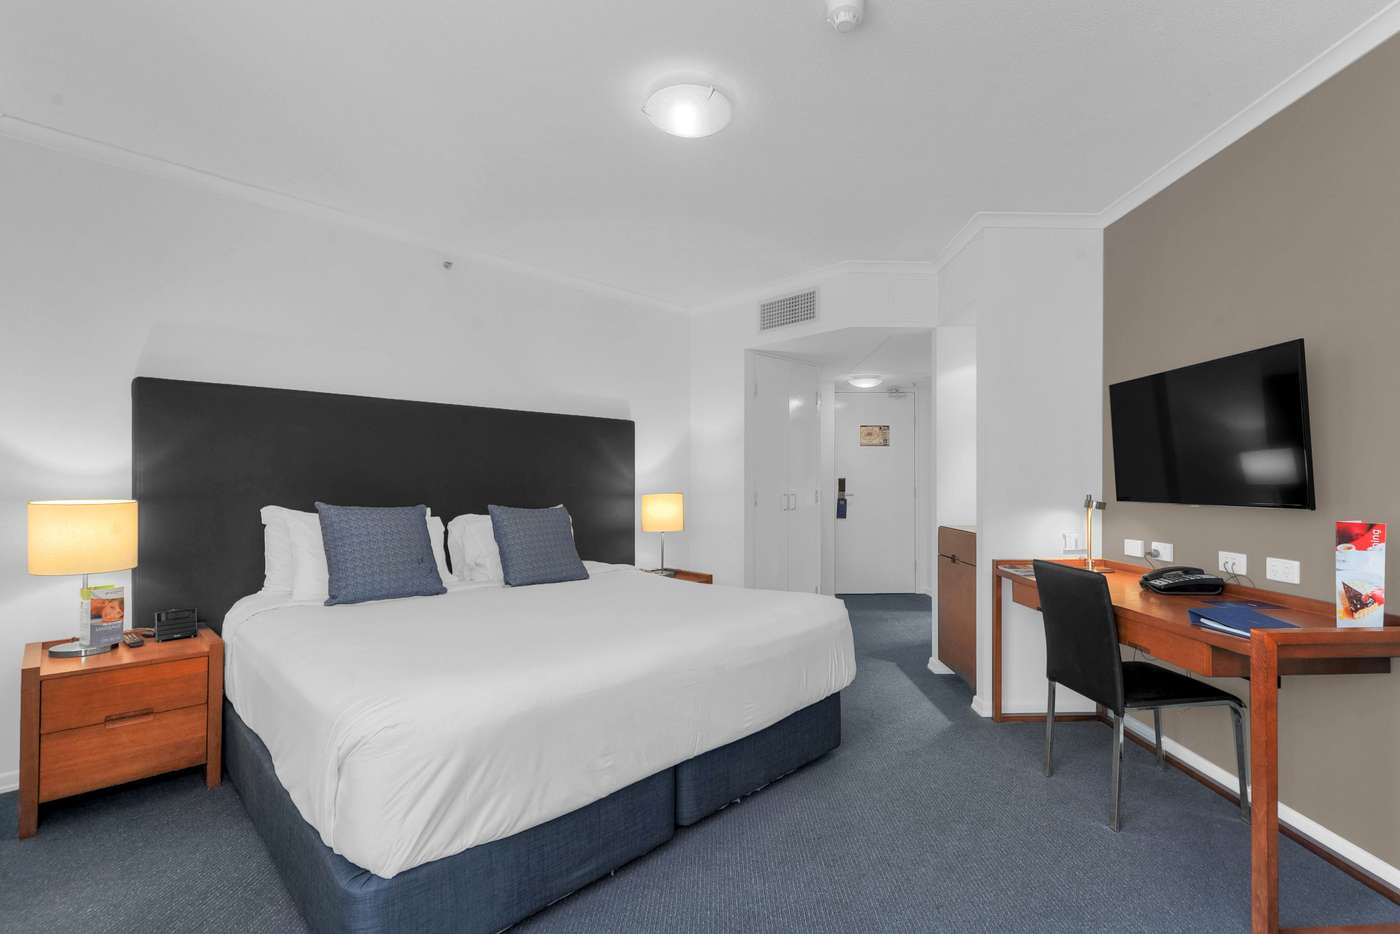 Main view of Homely studio listing, 1506/95 Charlotte Street, Brisbane City QLD 4000